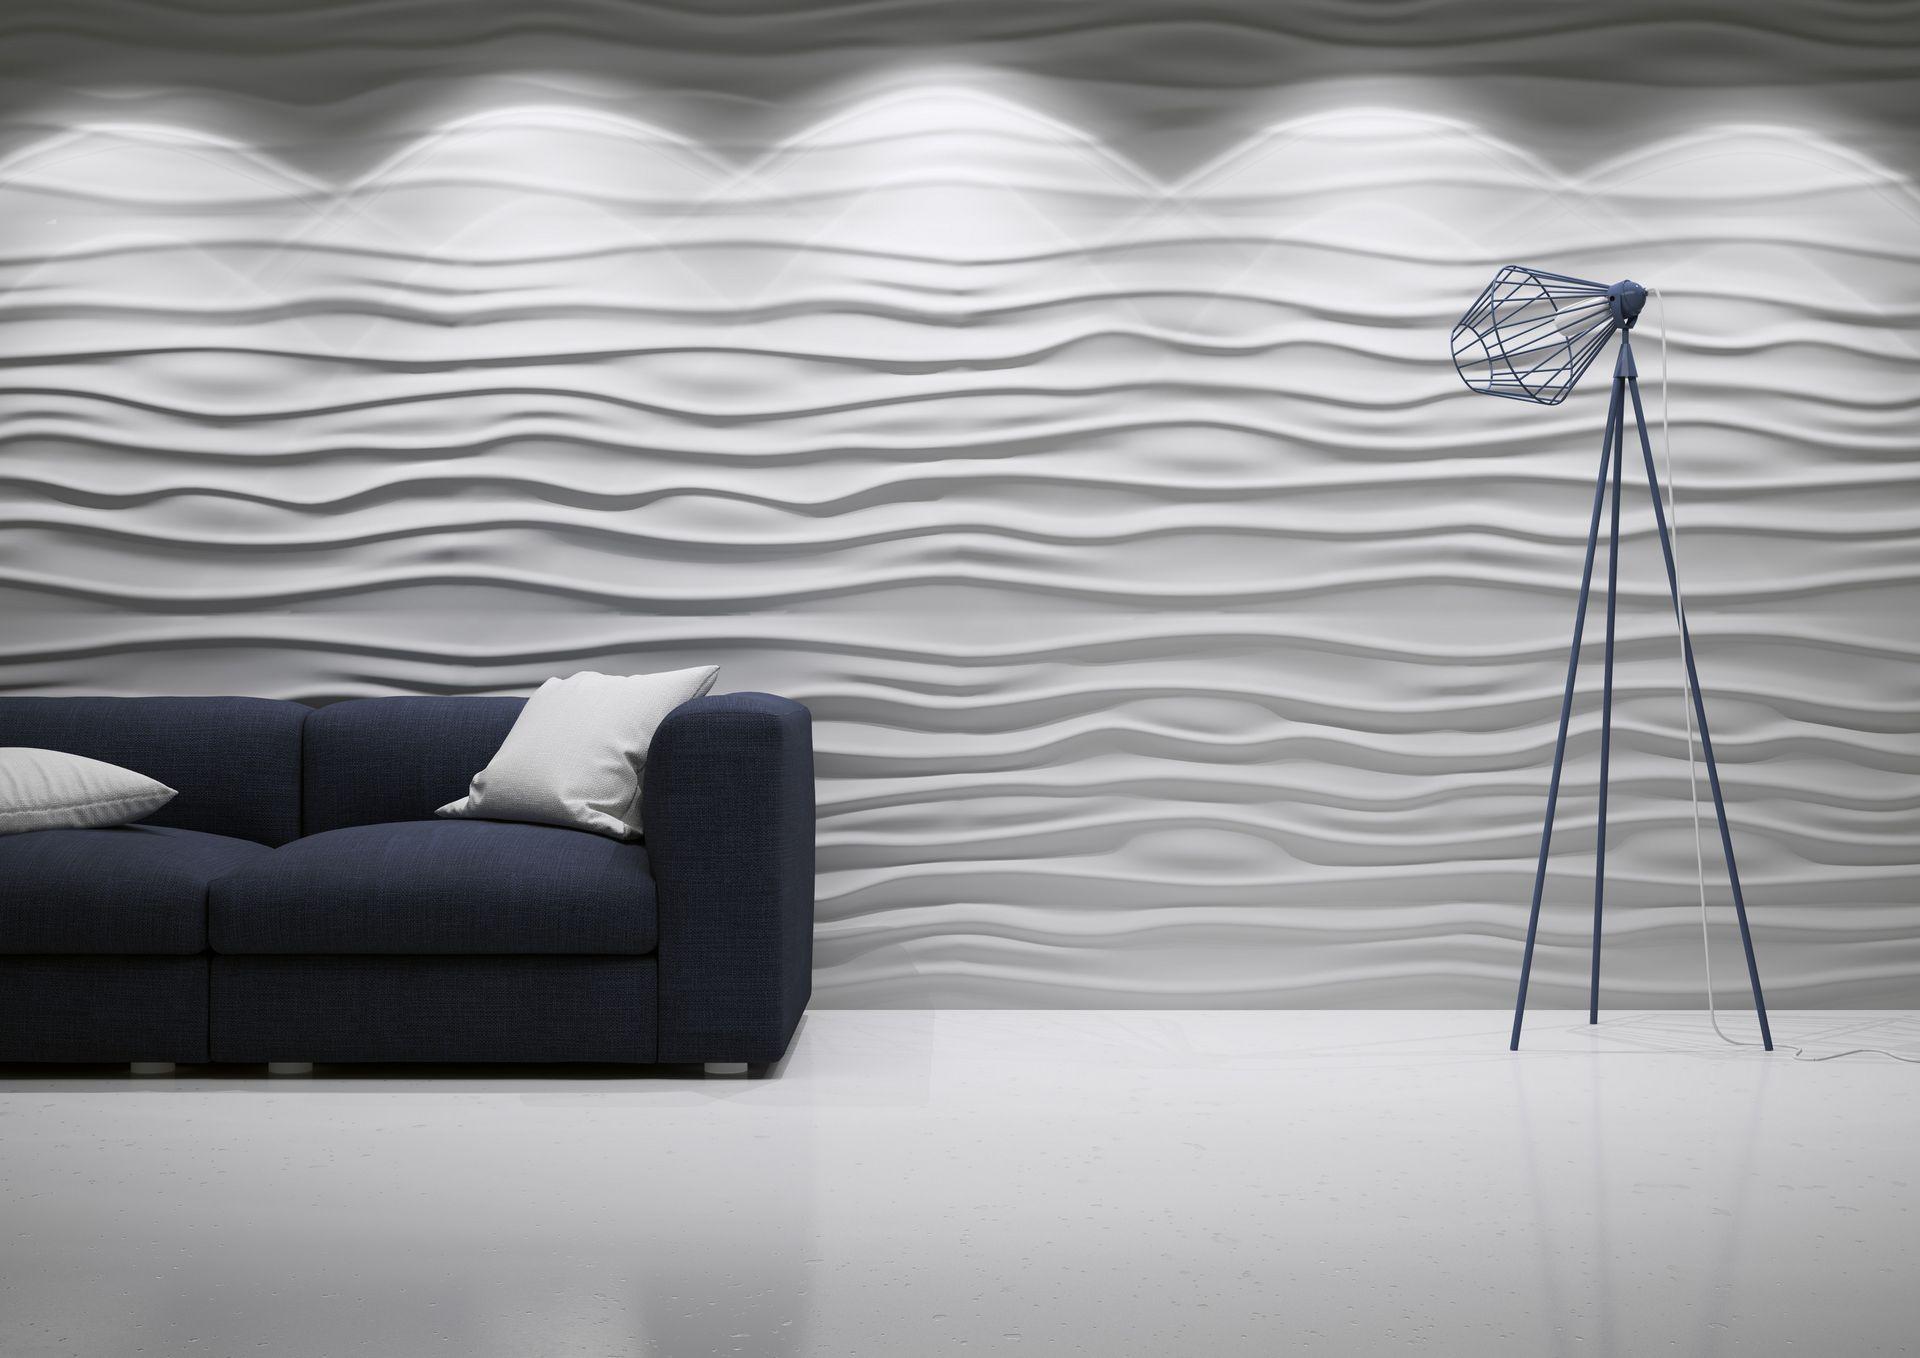 Na Fali Kreacji Panele Dekoracyjne Wave Choppy Curled